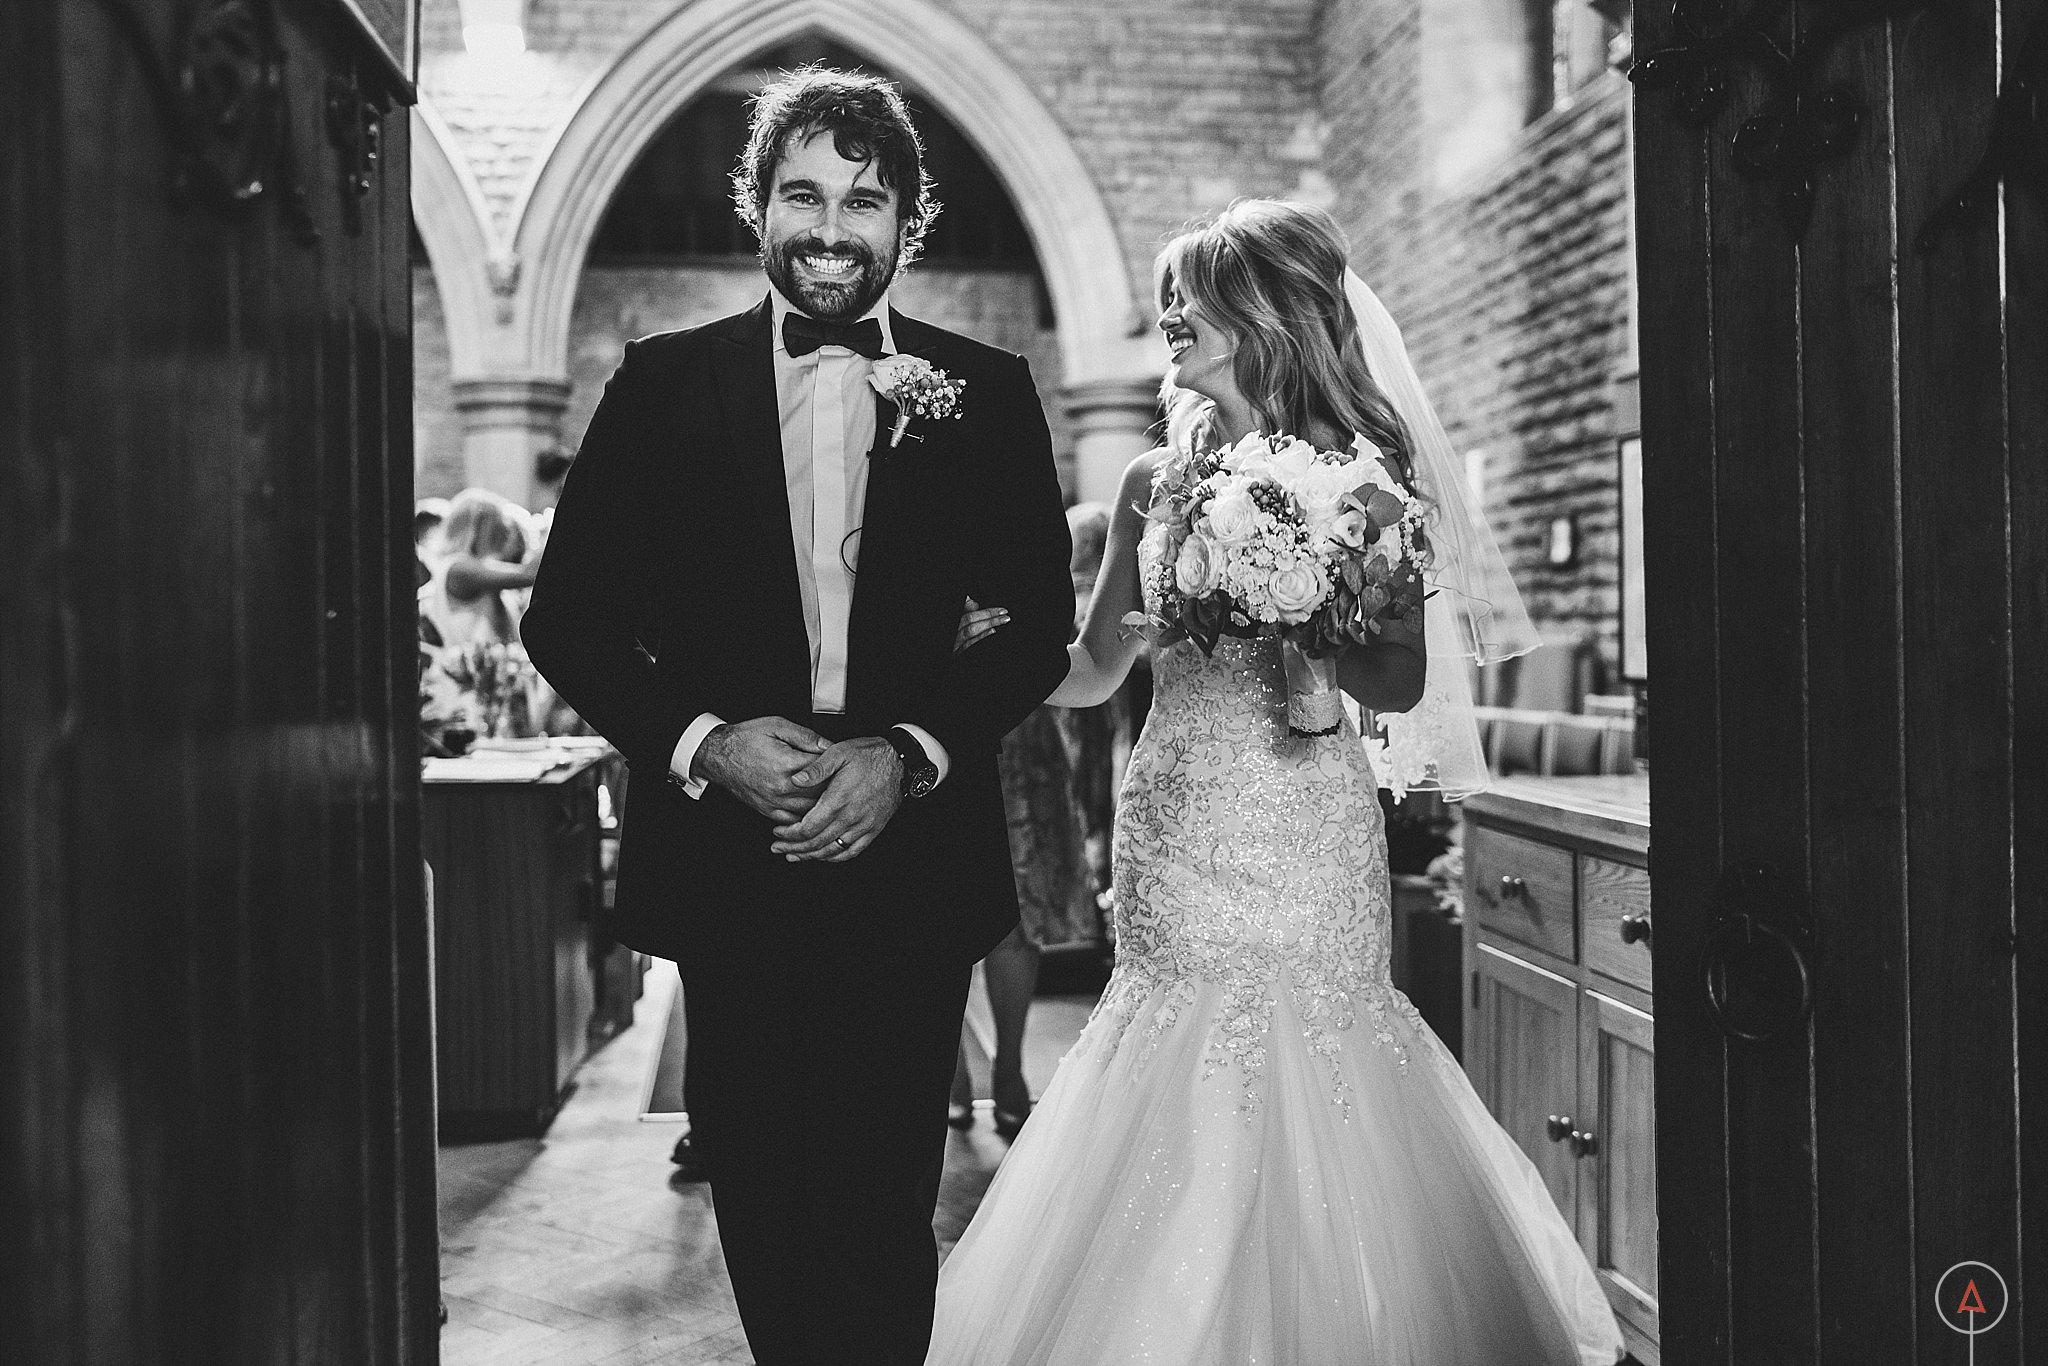 cardiff-wedding-photographer-aga-tomaszek_0368